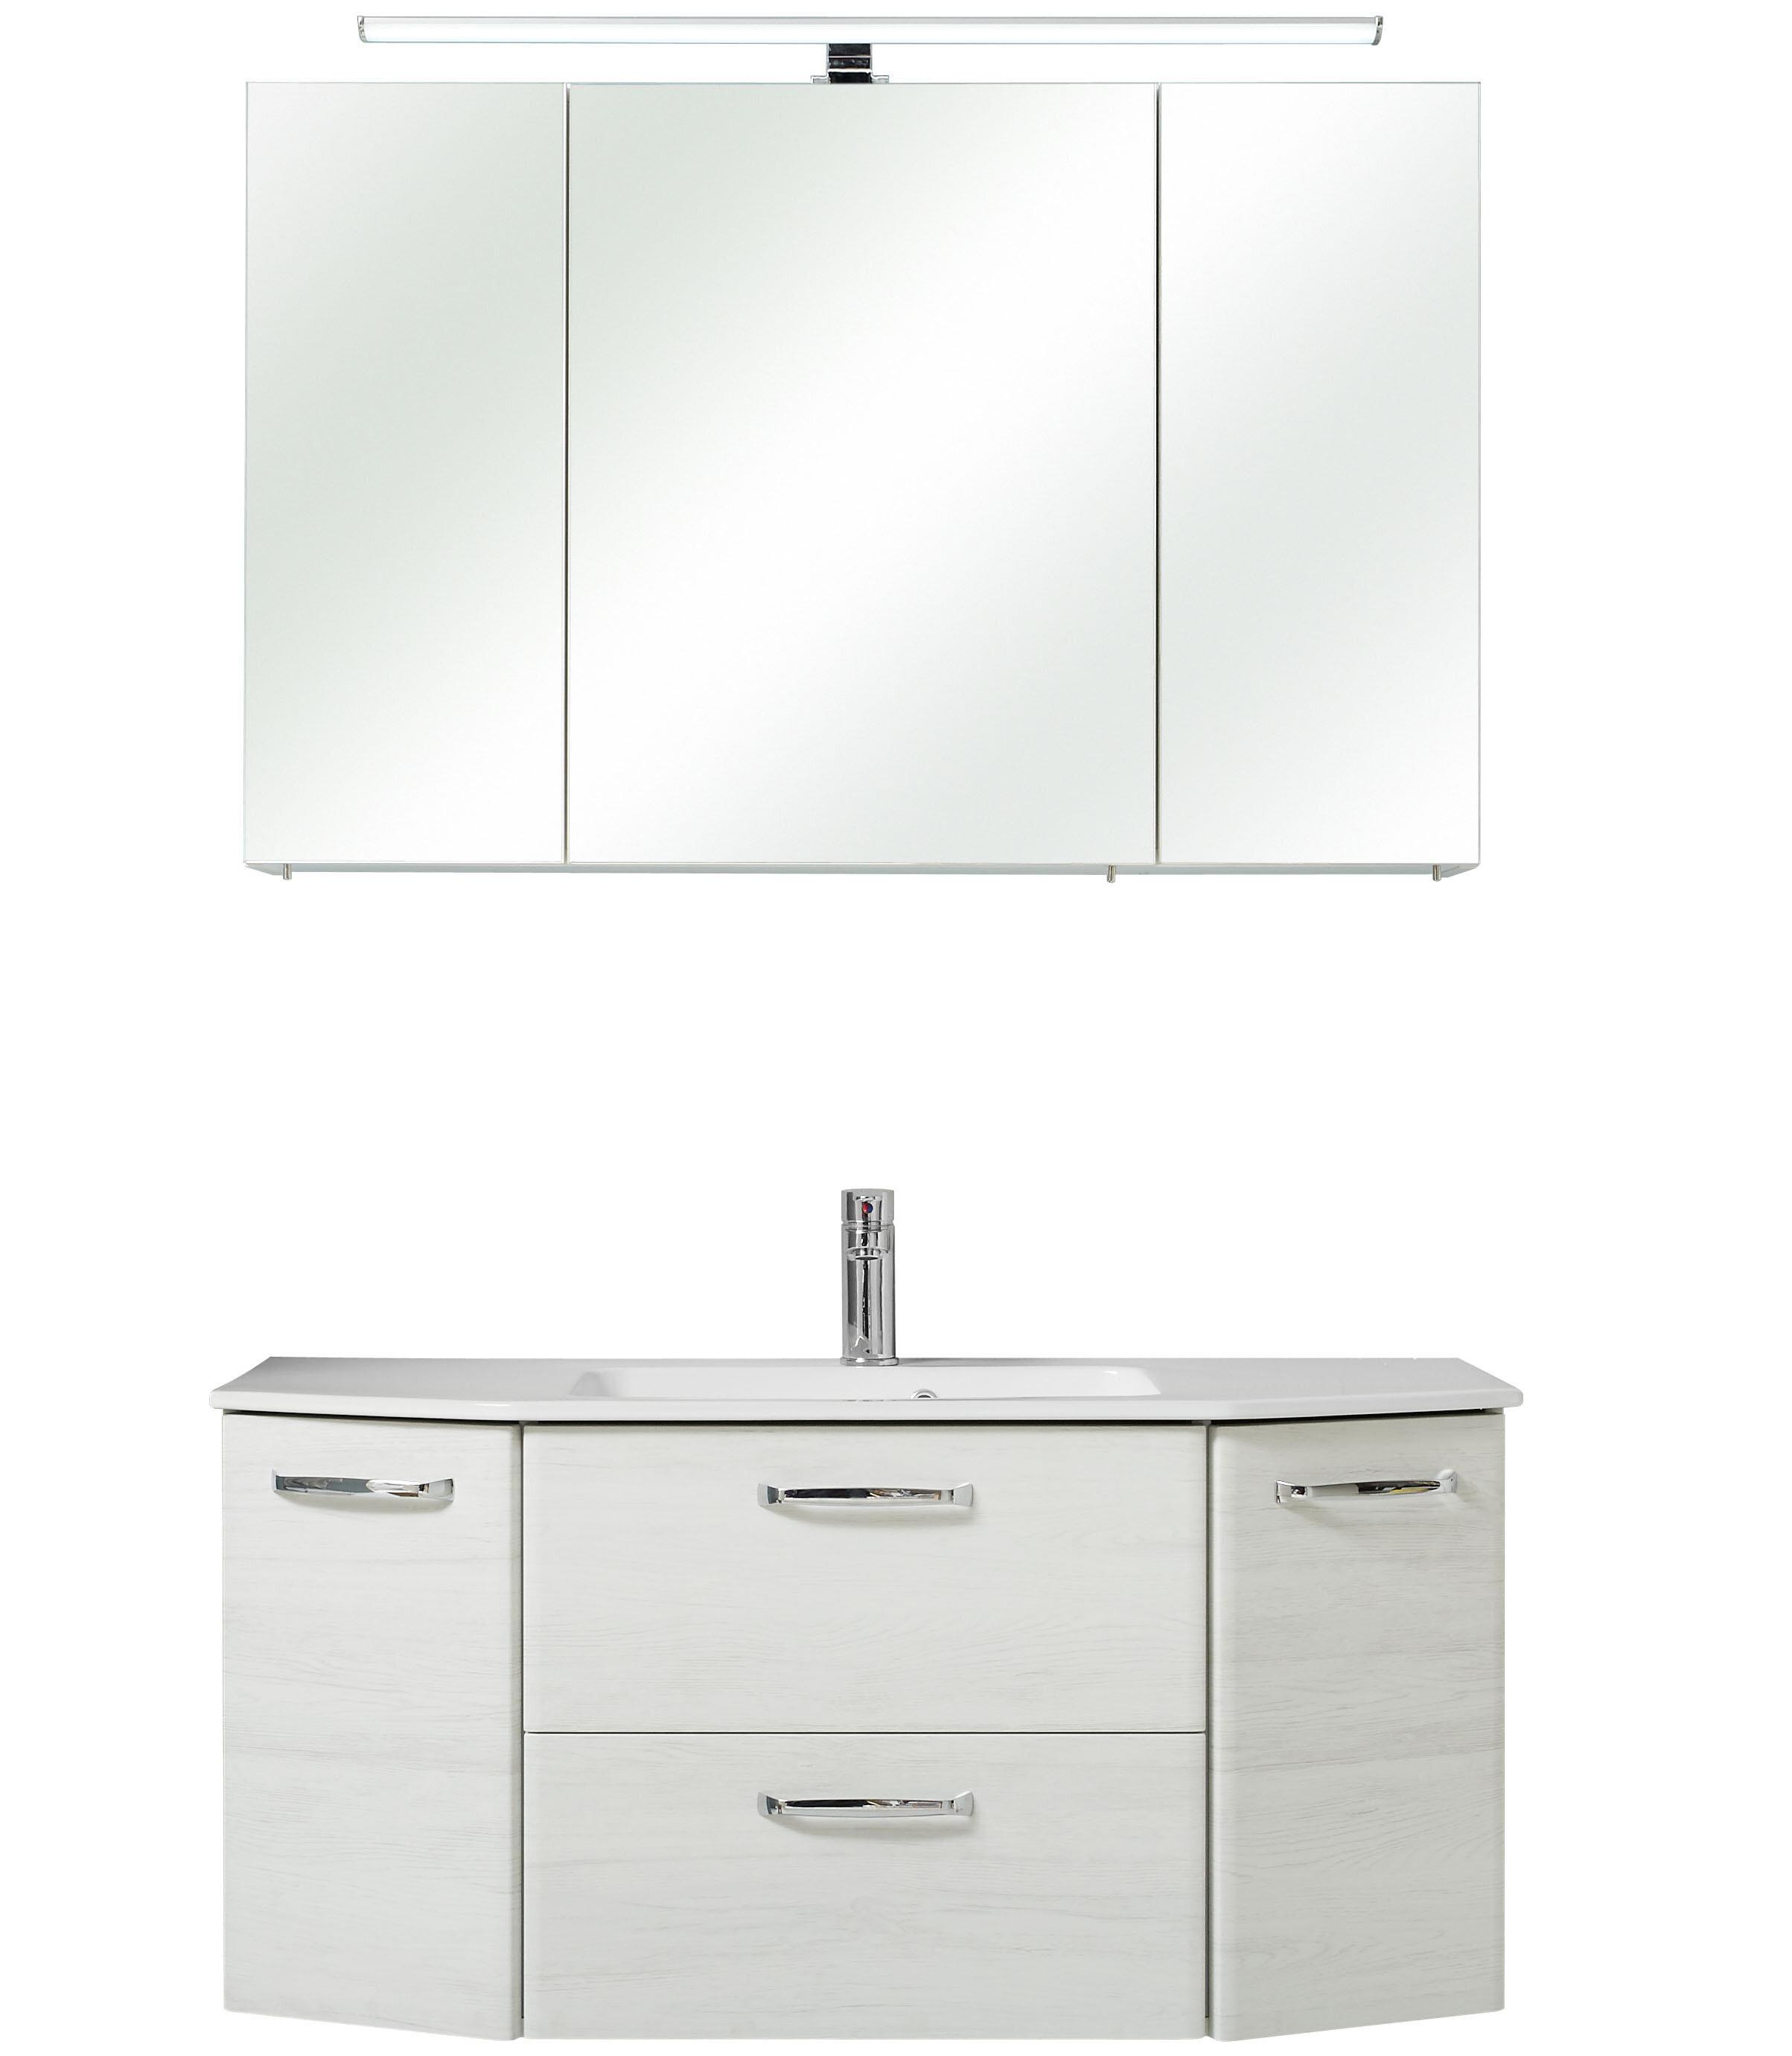 Amora 8 Piece Bathroom Storage Furniture Set